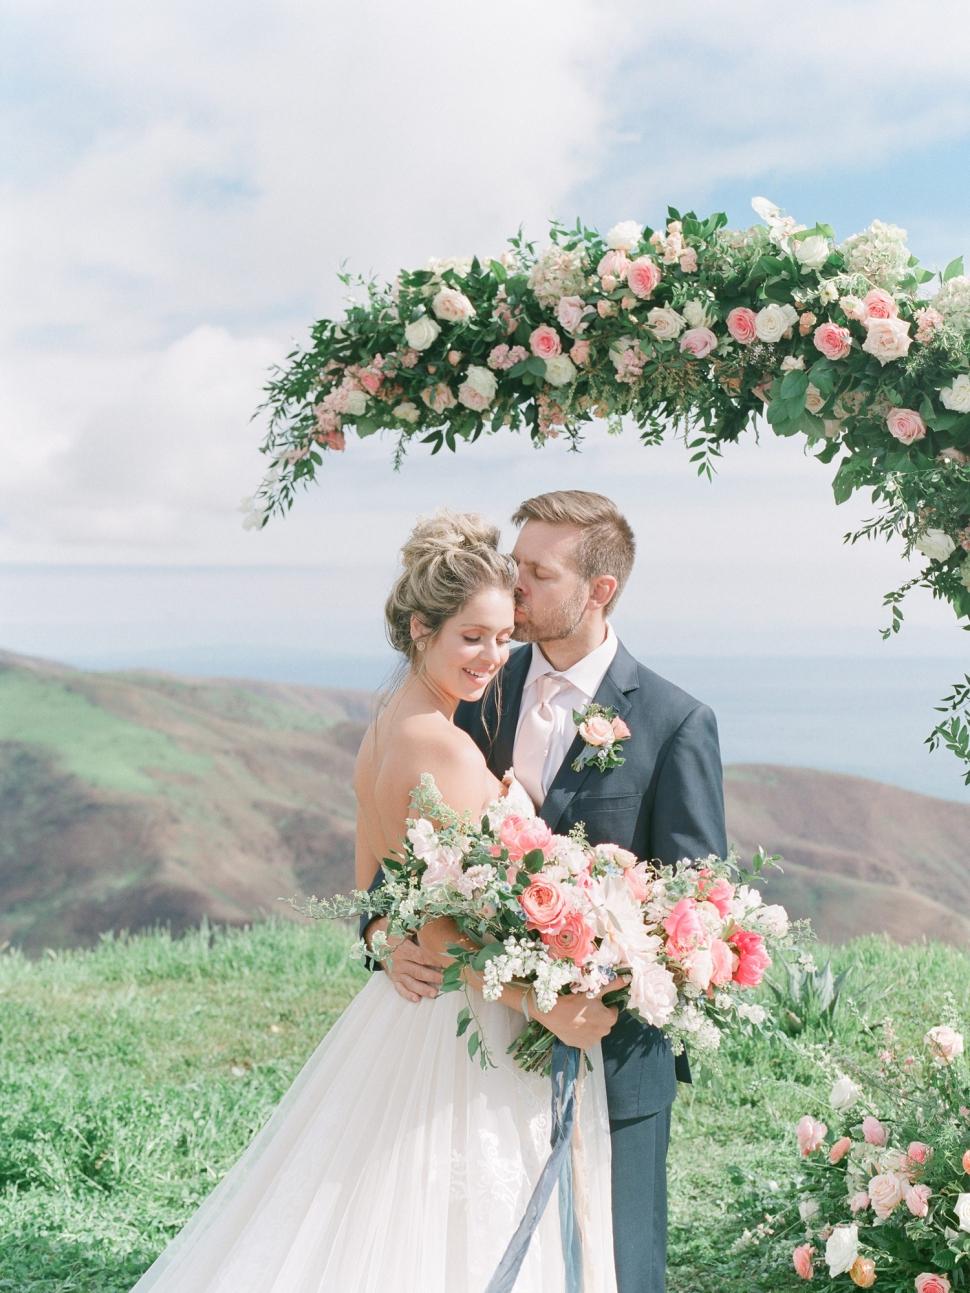 Southern-California-Malibu-Wedding-Photographer-Cassi-Claire-Deer-Creek-Ridge-Wedding_01.jpg